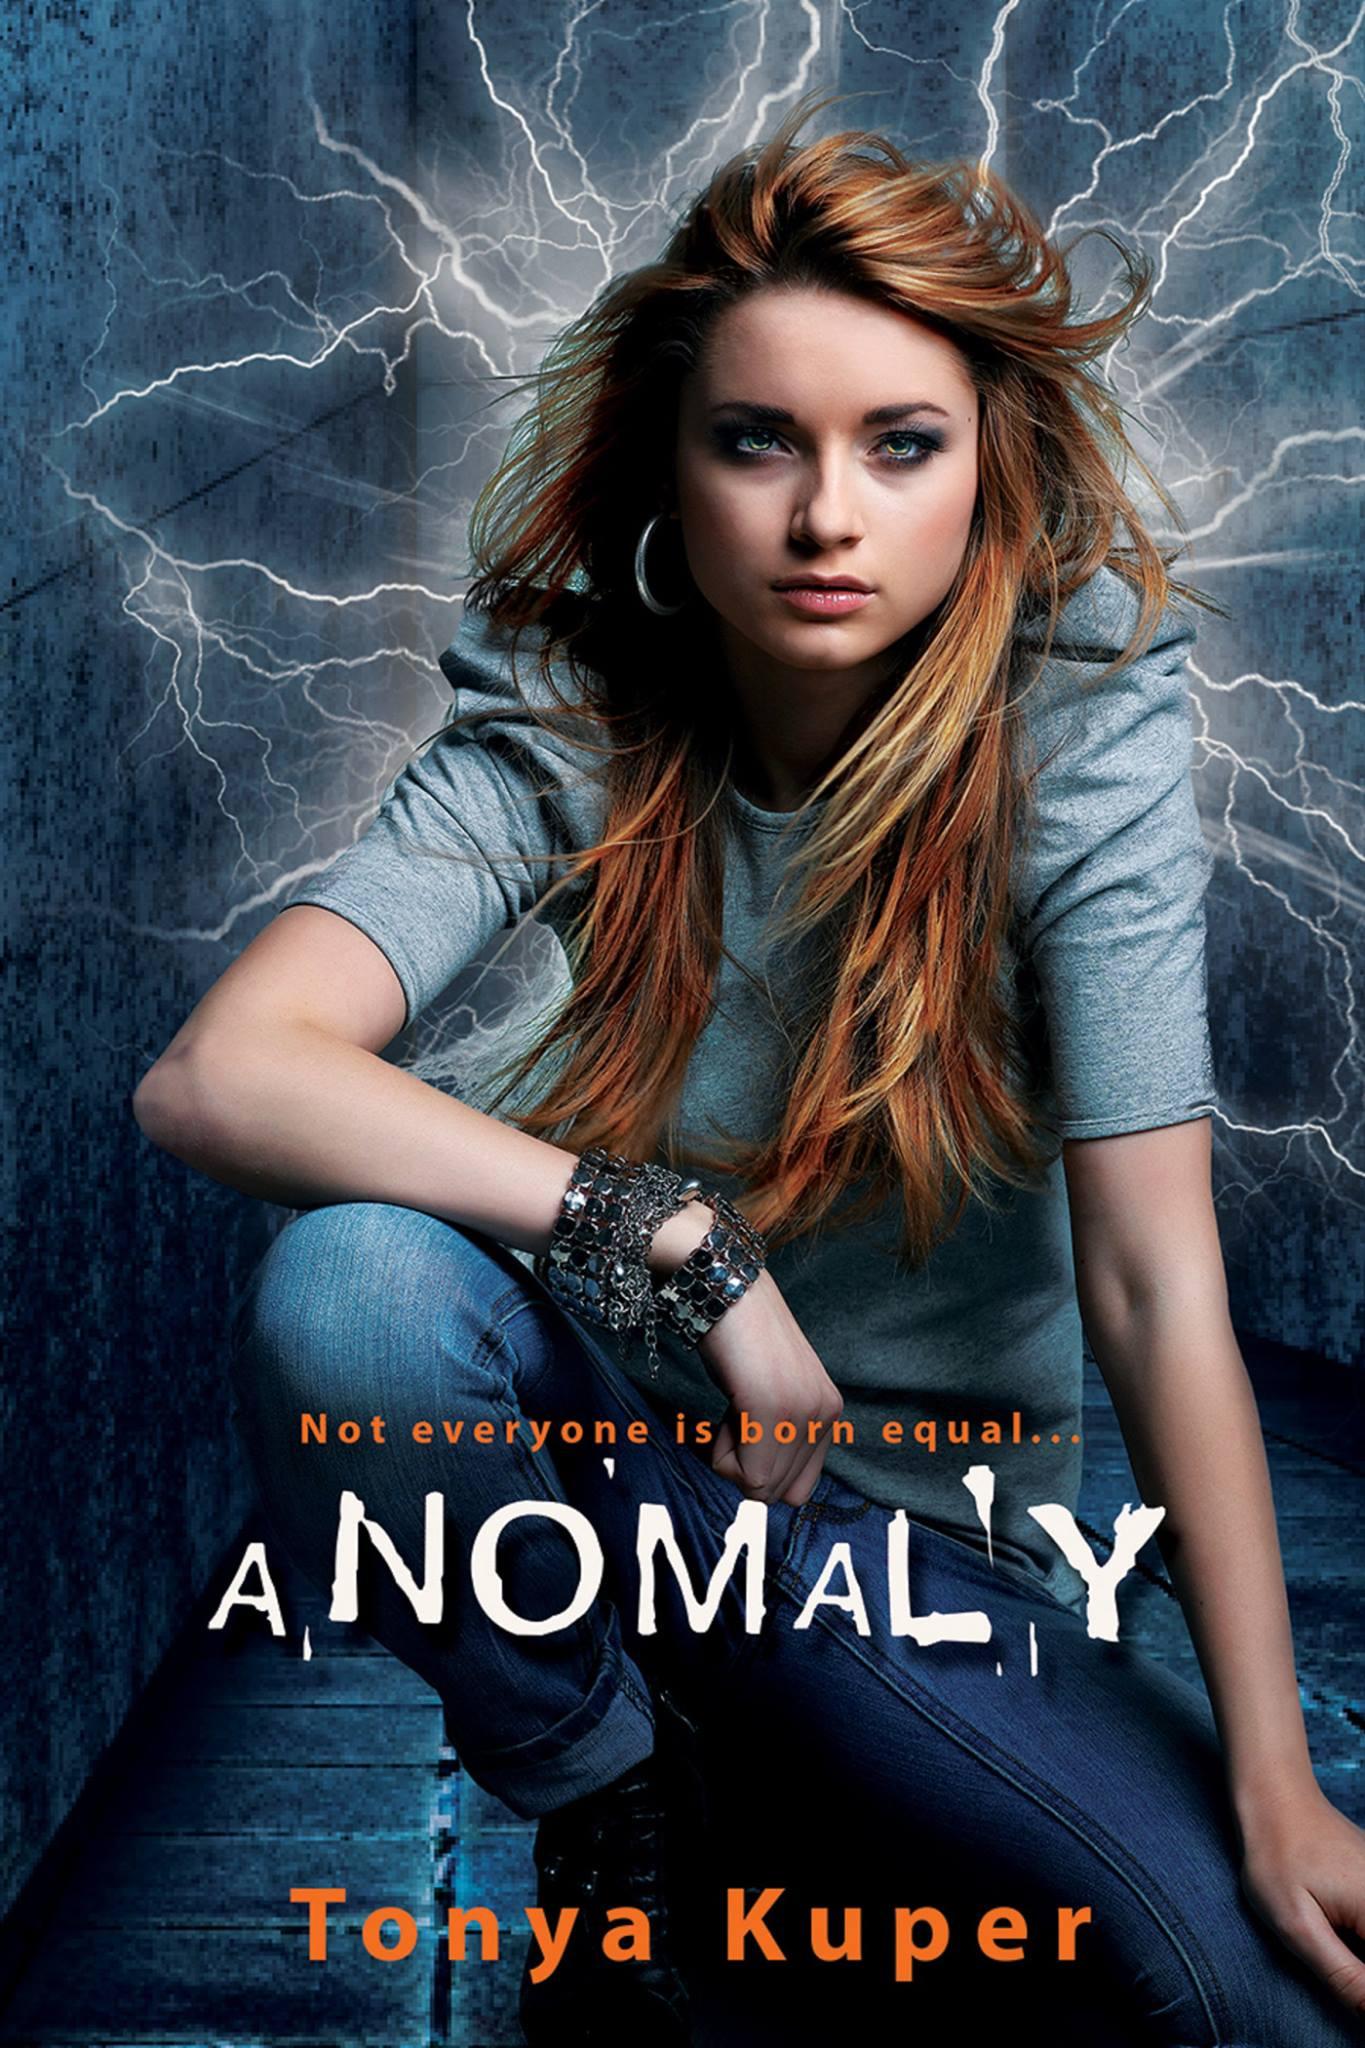 Anomaly (Schrodinger's Consortium #1) by Tonya Kuper